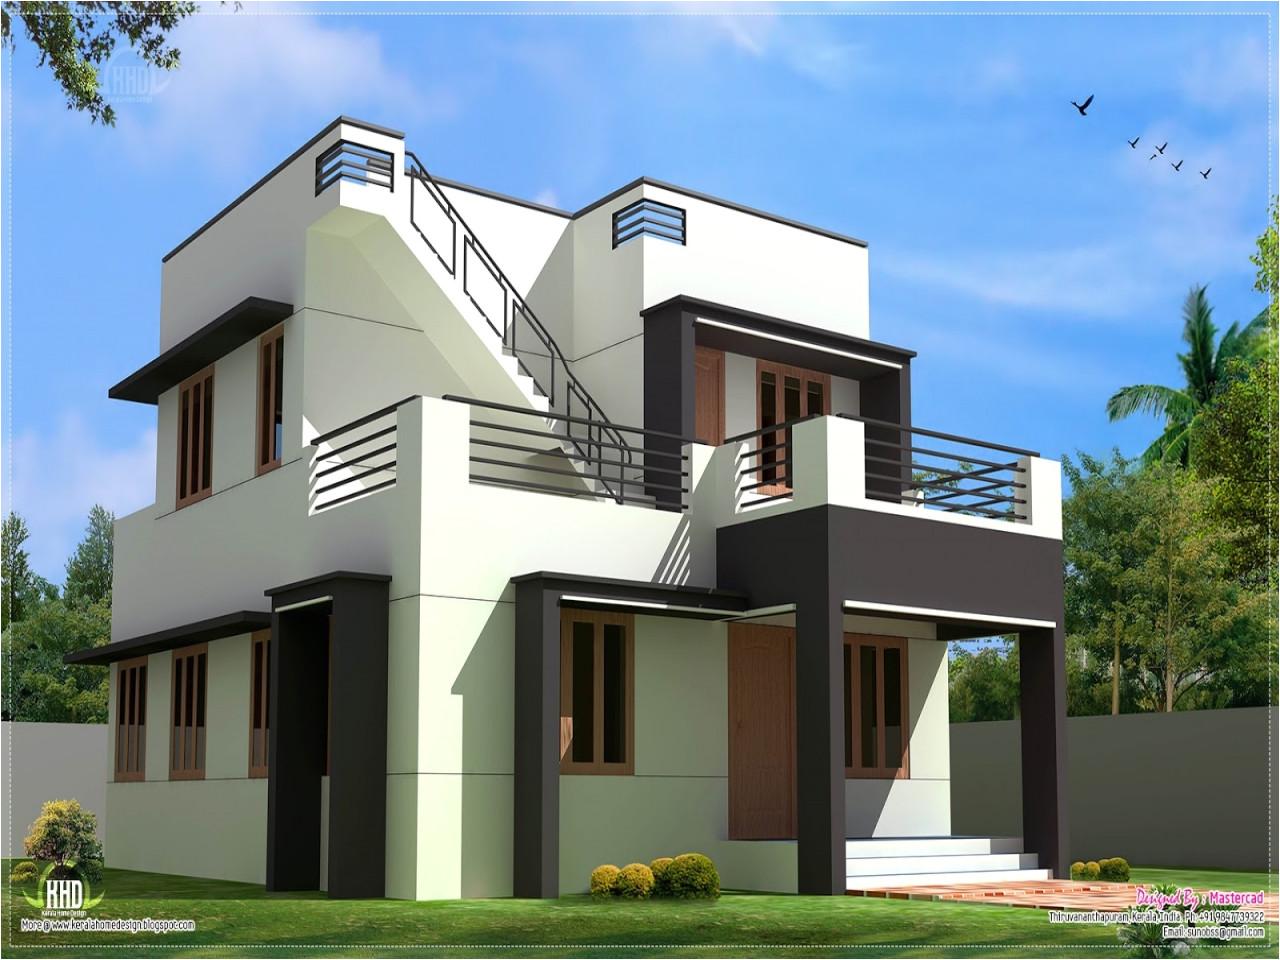 7f6c11c2c24da661 shipping container homes interior design design home modern house plans